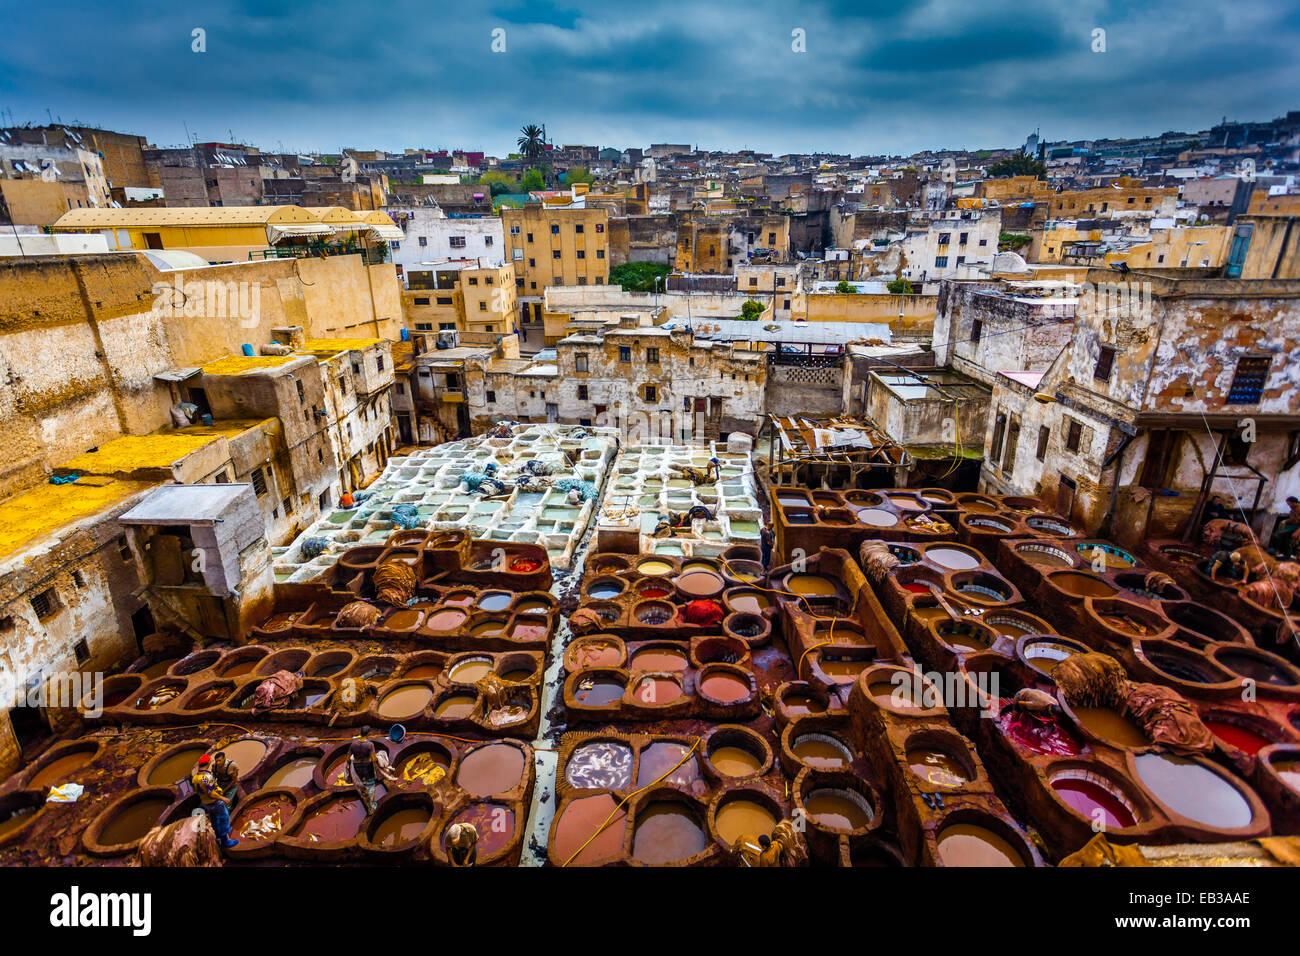 Morocco, Fes, Medina, Tanneries souk - Stock Image